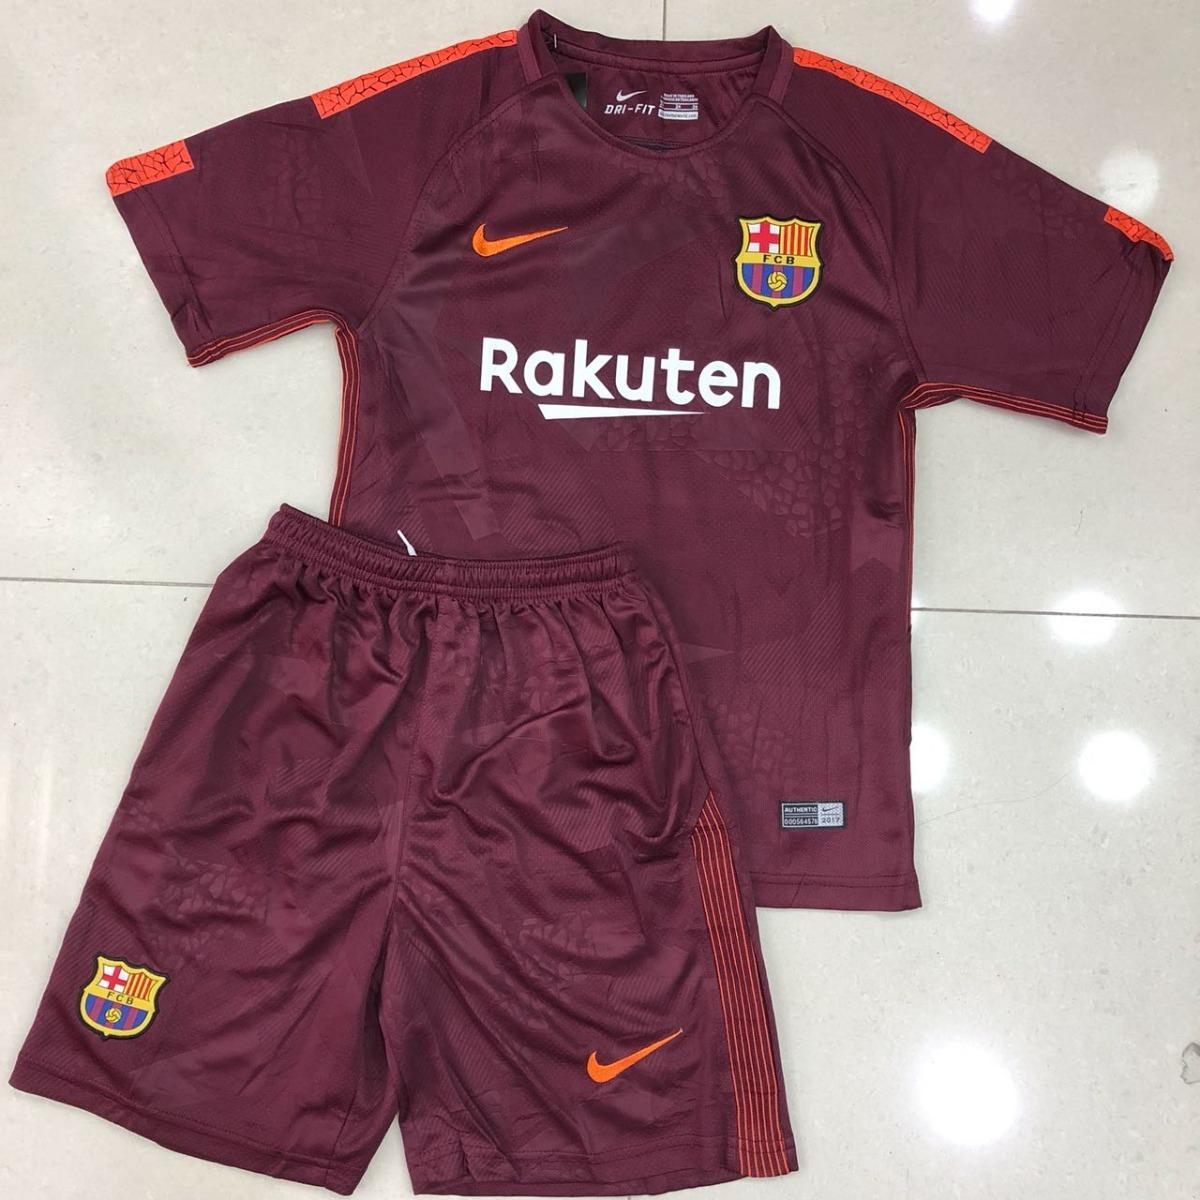 bfd2579f65 uniforme infantil juvenil camisa e shorts barcelona 2017 thi. Carregando  zoom.